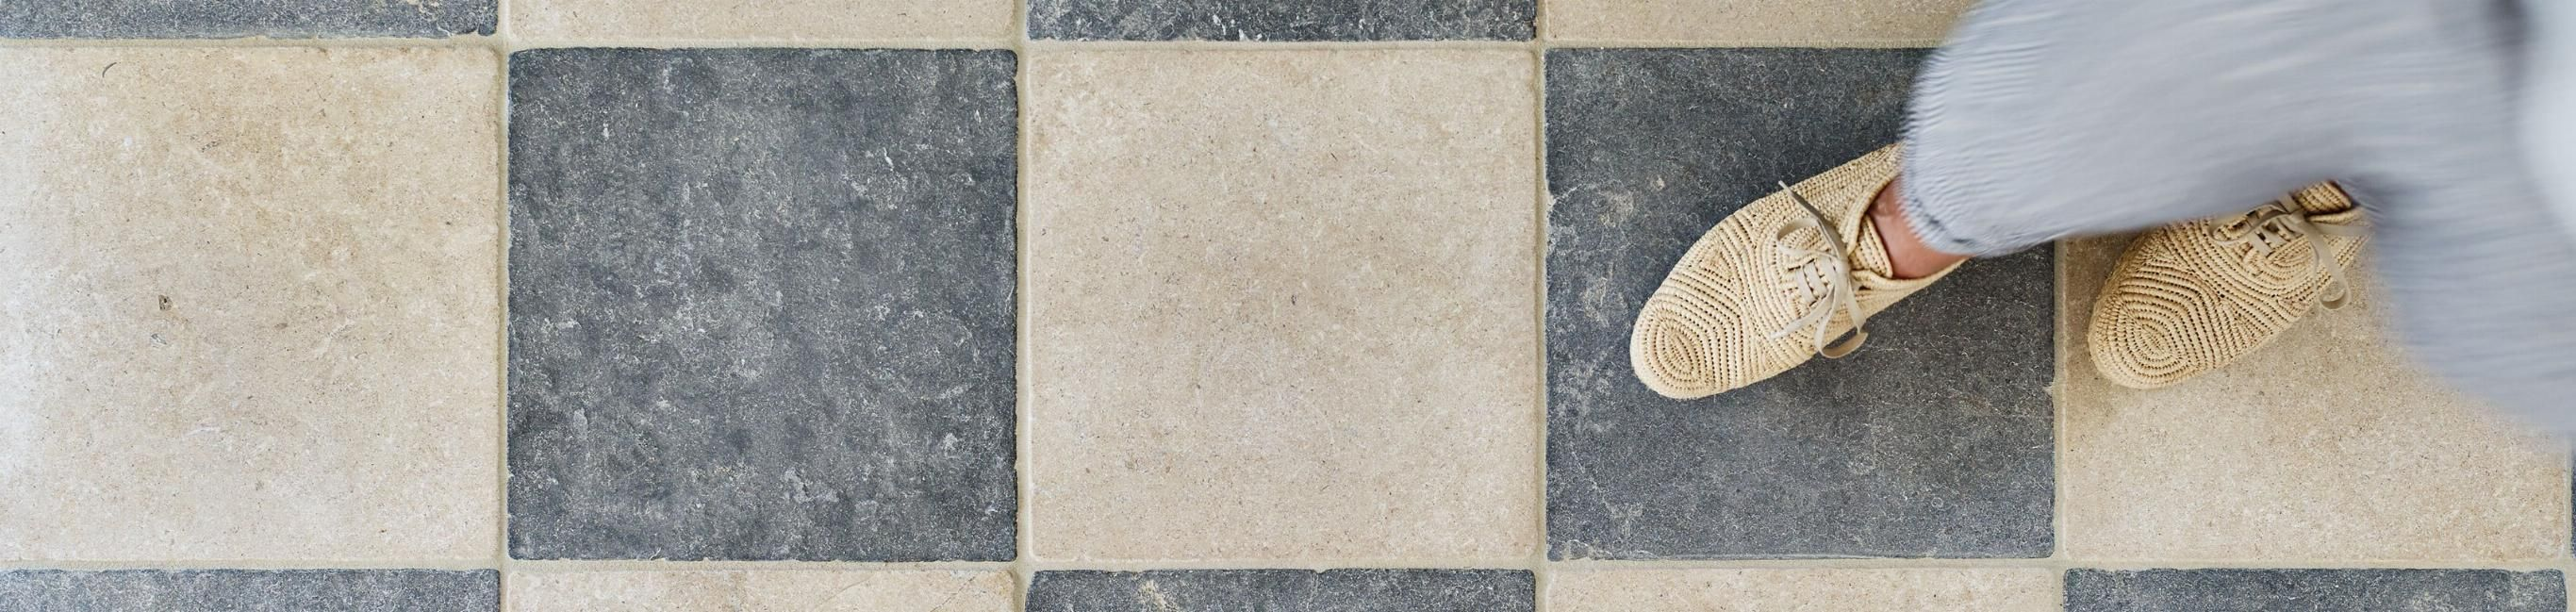 Pin By Nina Ryden On Finishes Wall Floor Tiles Tile Floor Flooring